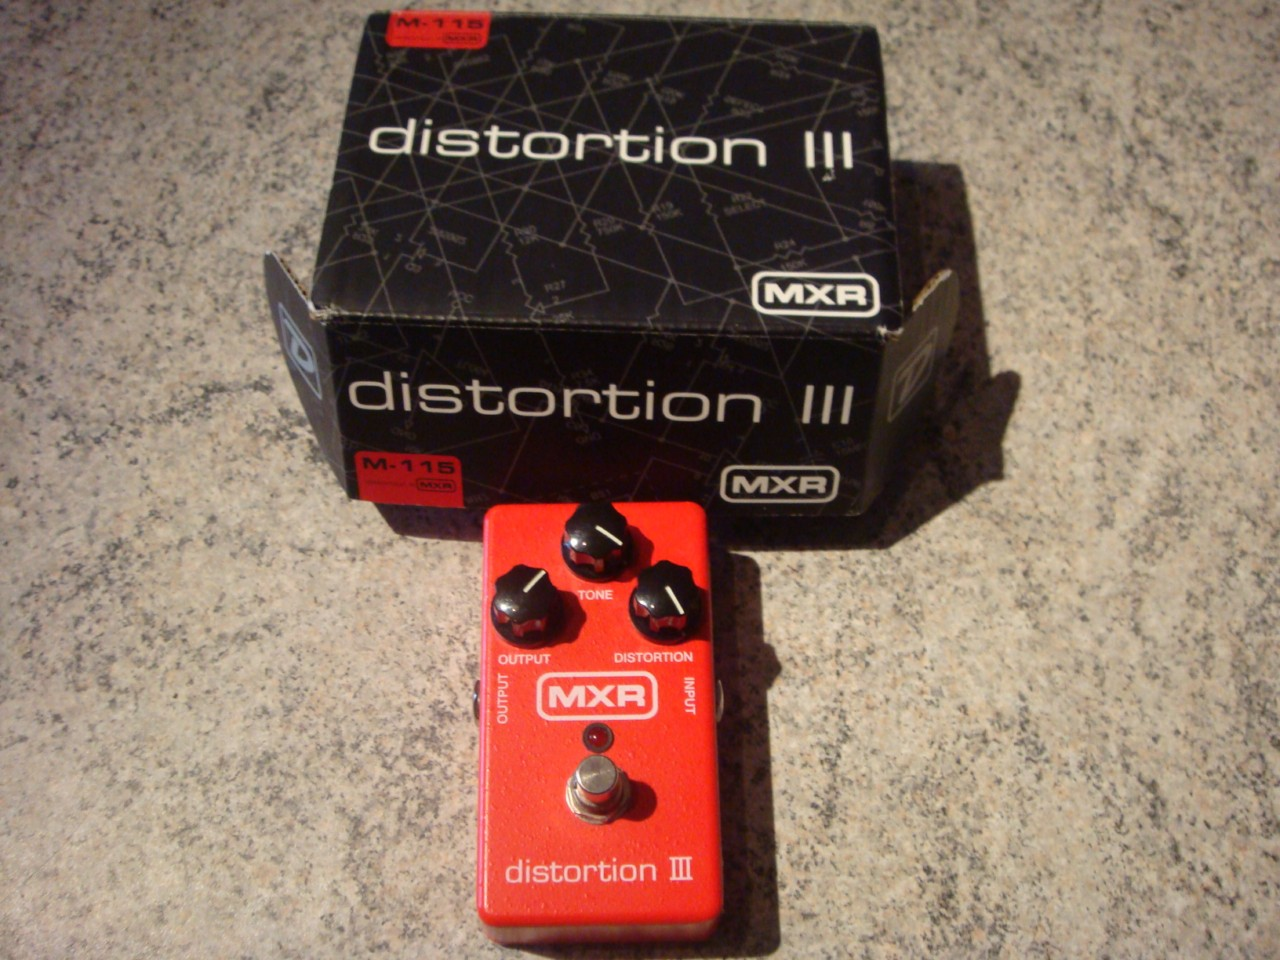 photo mxr m115 distortion iii mxr m 115 distortion iii 101623 audiofanzine. Black Bedroom Furniture Sets. Home Design Ideas